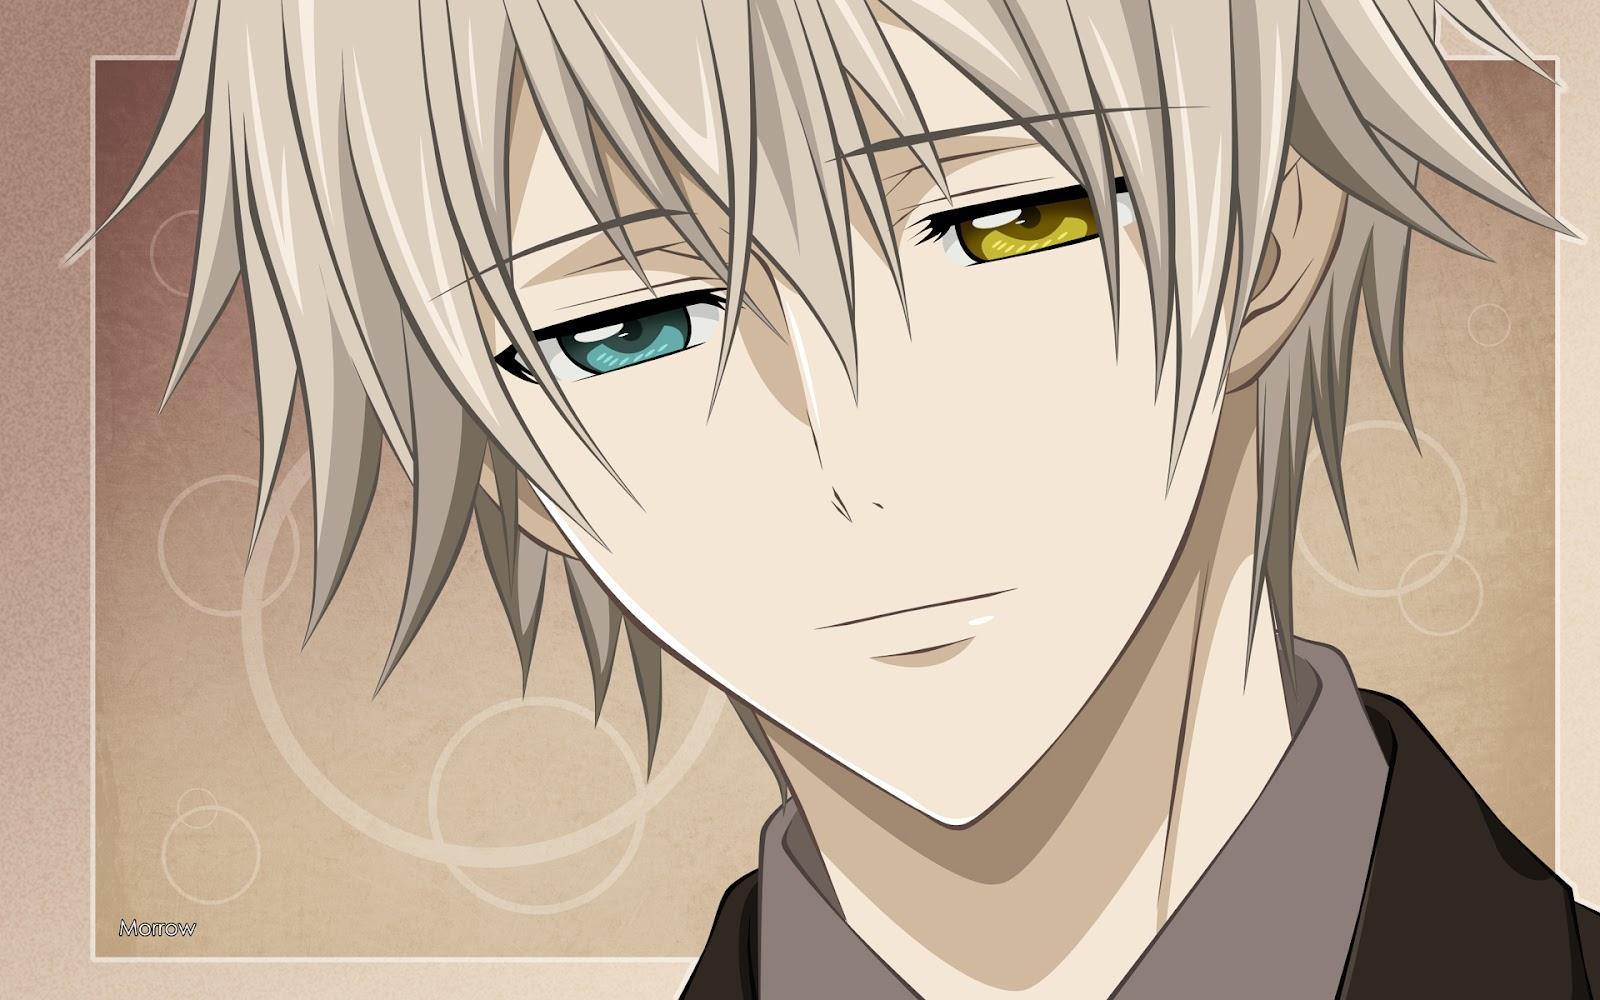 Anime Characters Yellow Eyes : Shadowy kisses space heterocromía